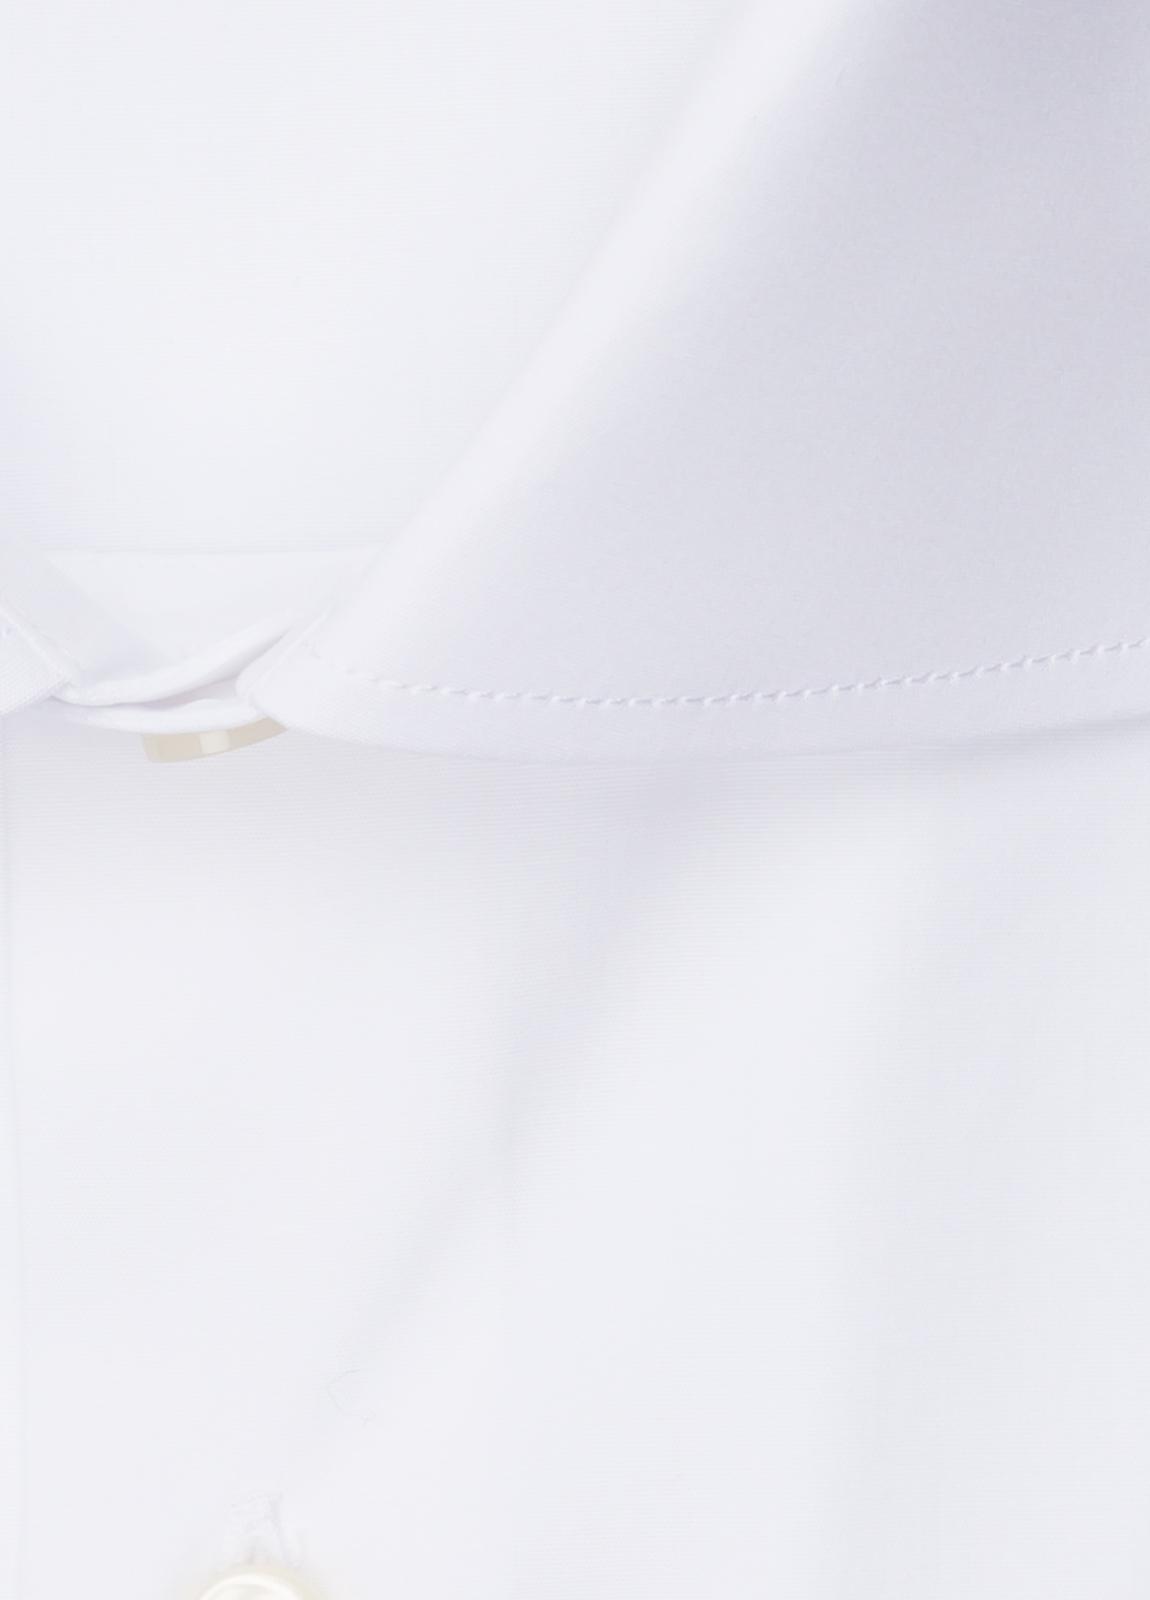 Camisa vestir FUREST COLECCIÓN Slim Fit Puño Doble Algodón Popelin - Ítem2